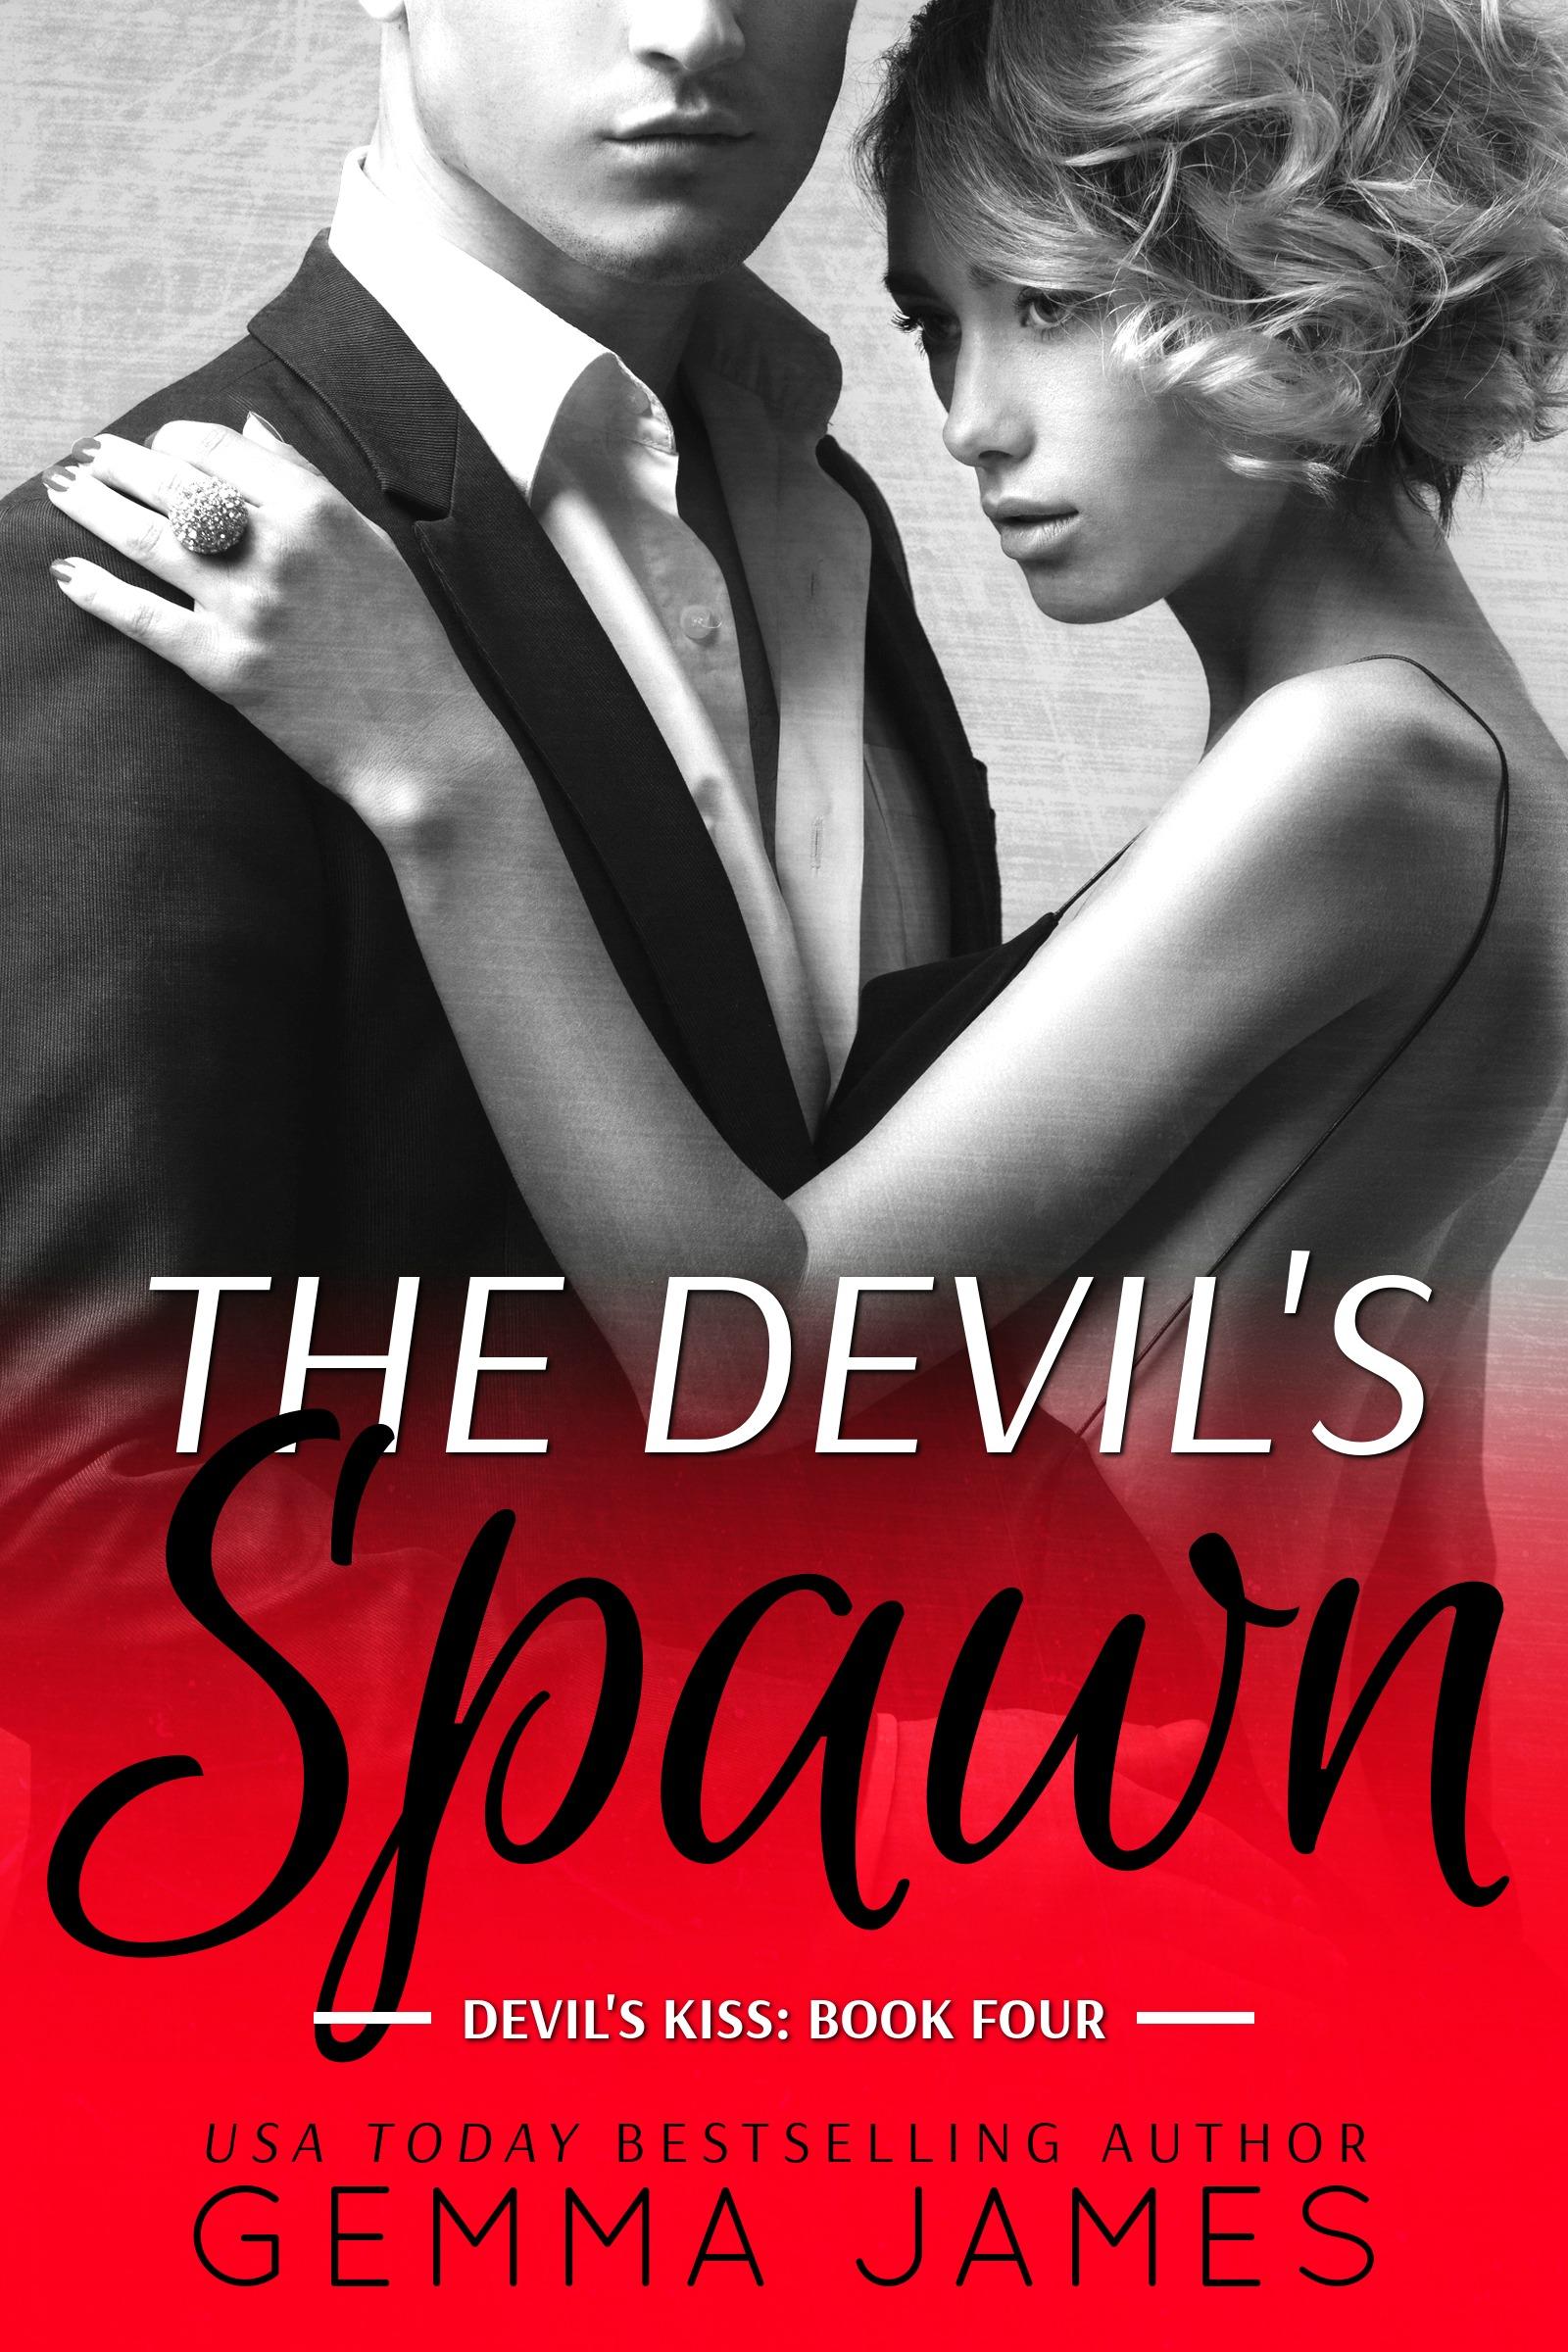 The Devil's Spawn Ebook Cover.jpg